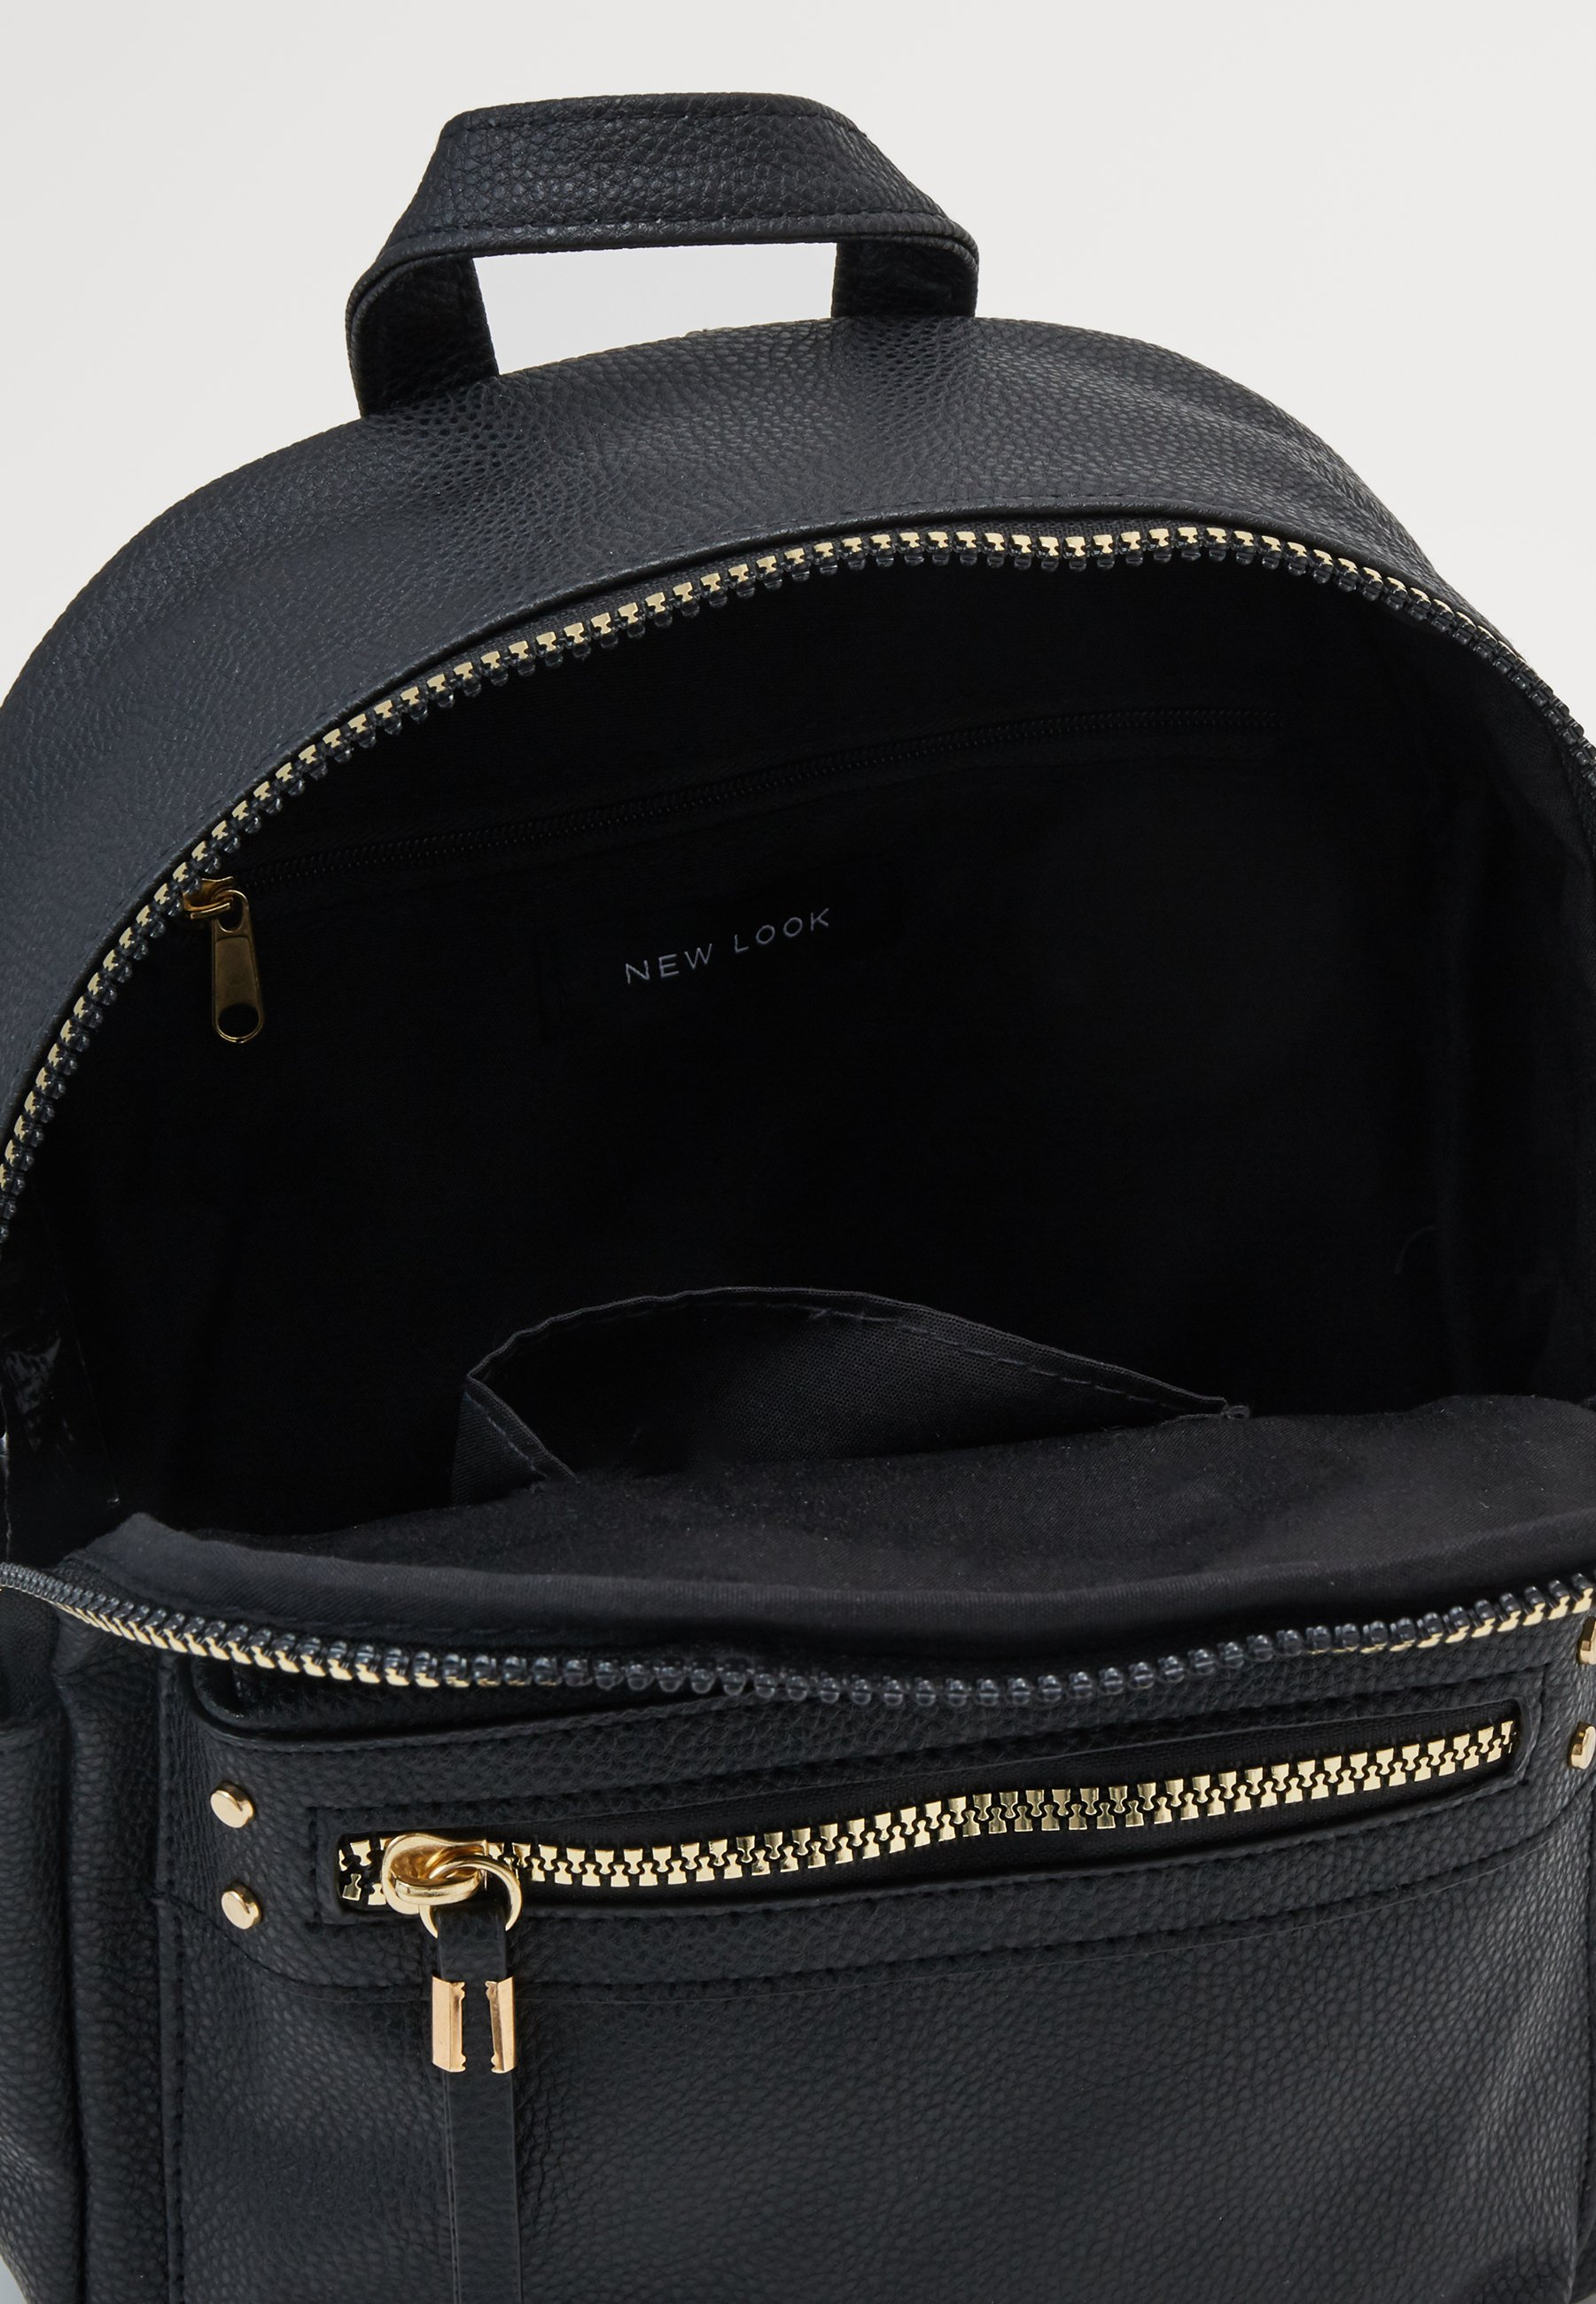 New Look PHILIPPA MINI BACKPACK - Ryggsekk - black/svart Q3lIx5cV3AAiyq4